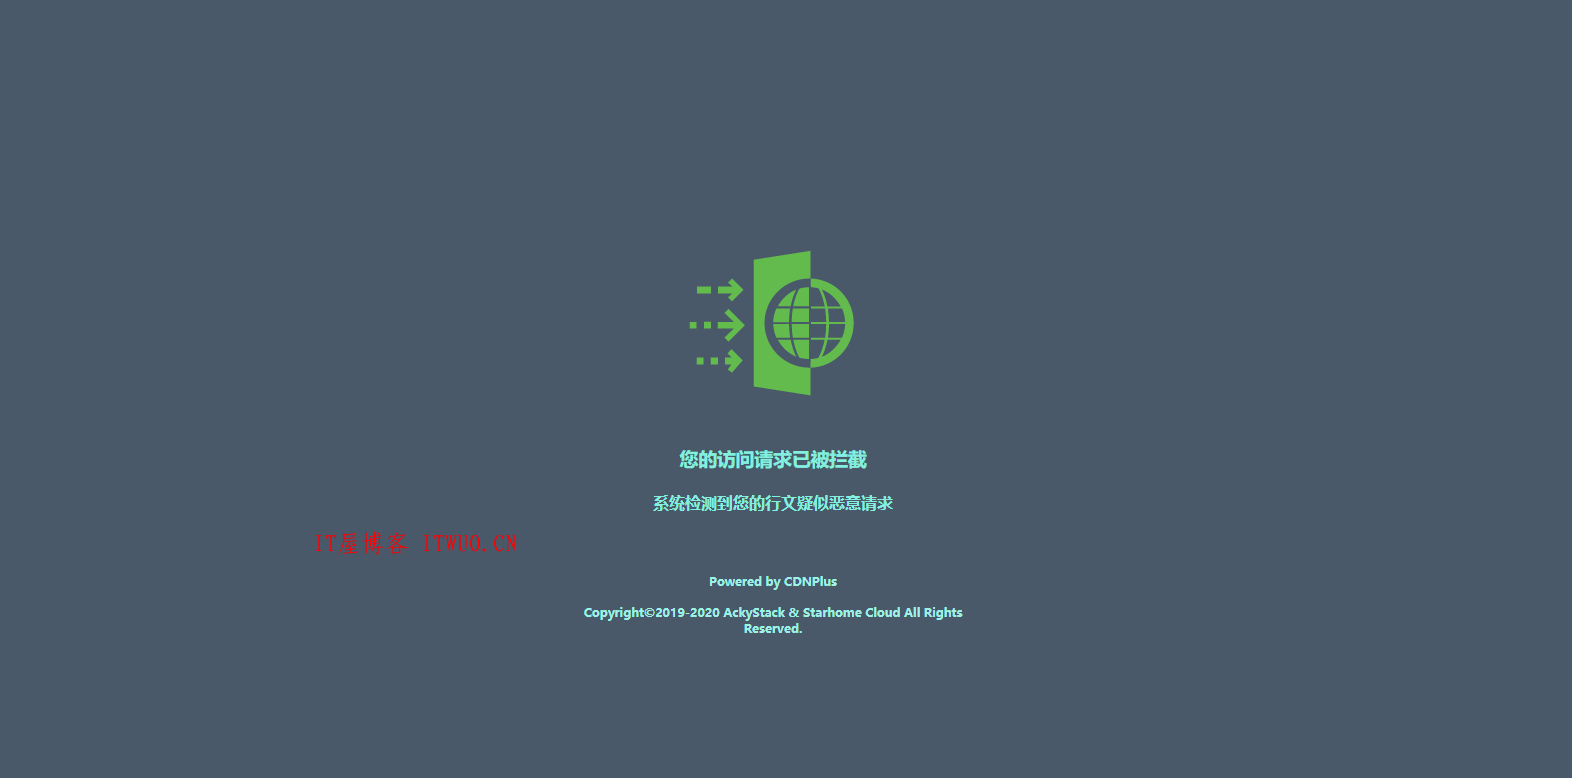 【html源码】错误或拦截页面的html代码